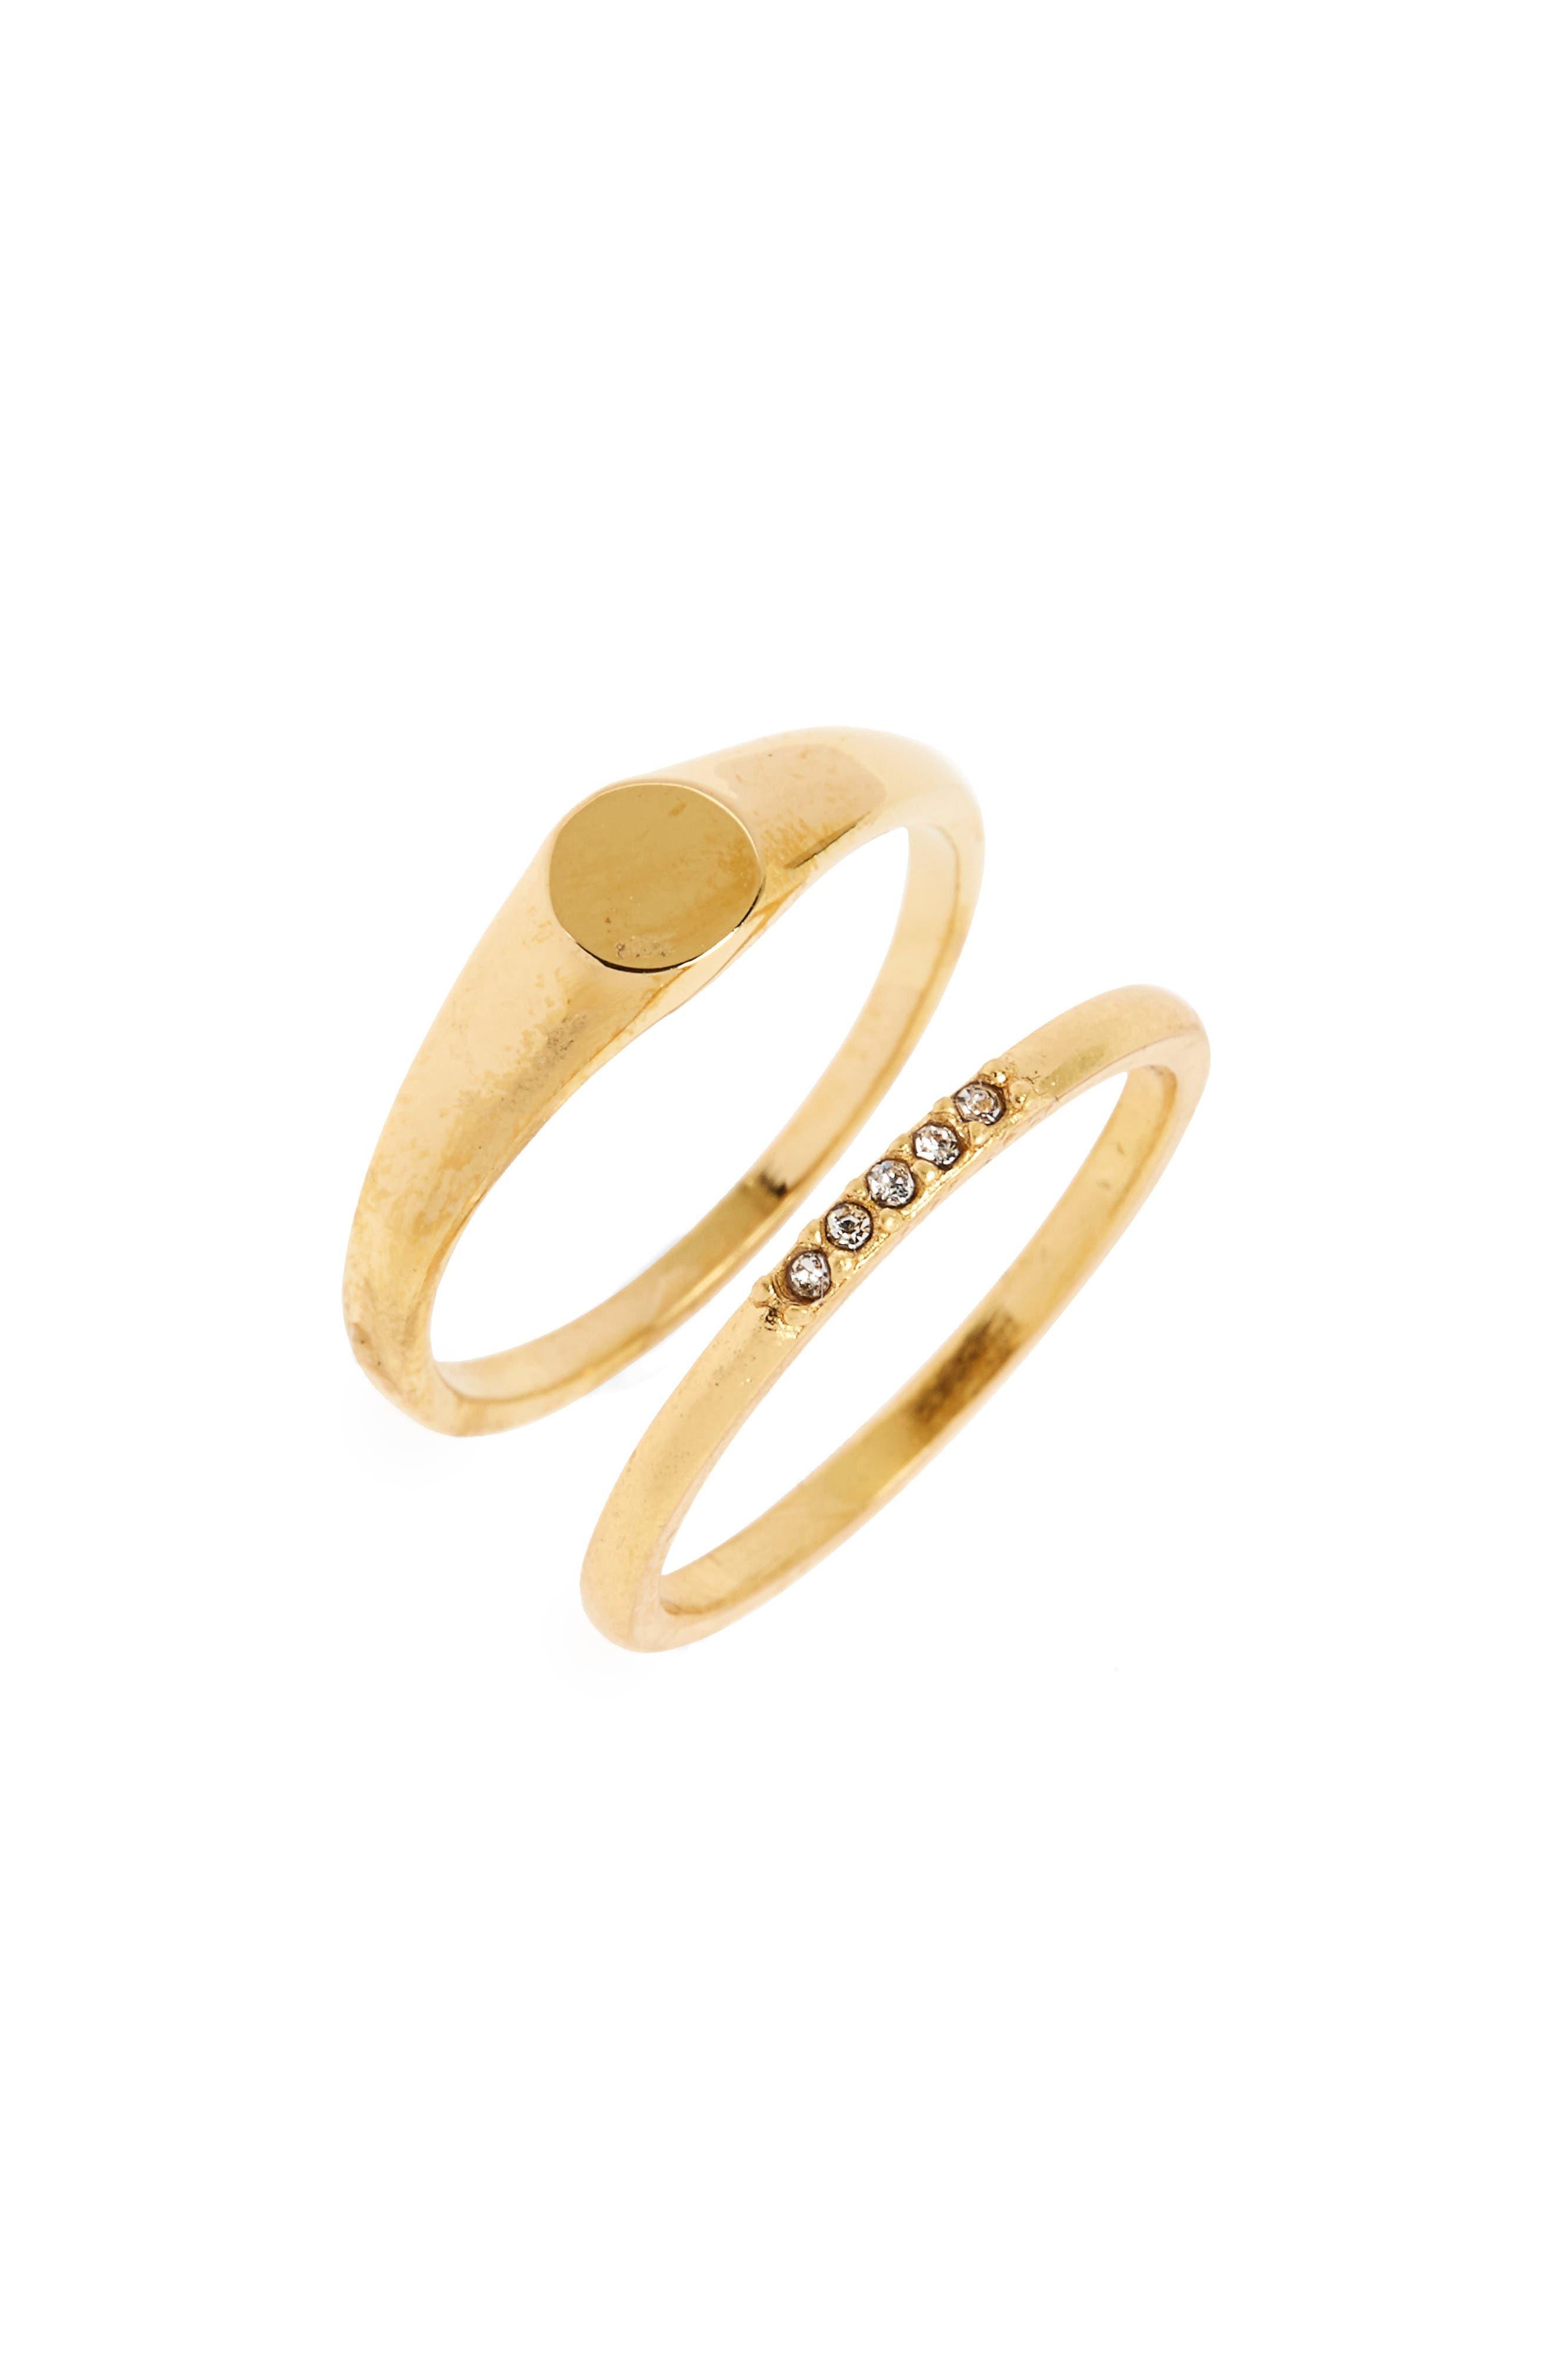 Main Image - Madewell Set of 2 Pinky Rings